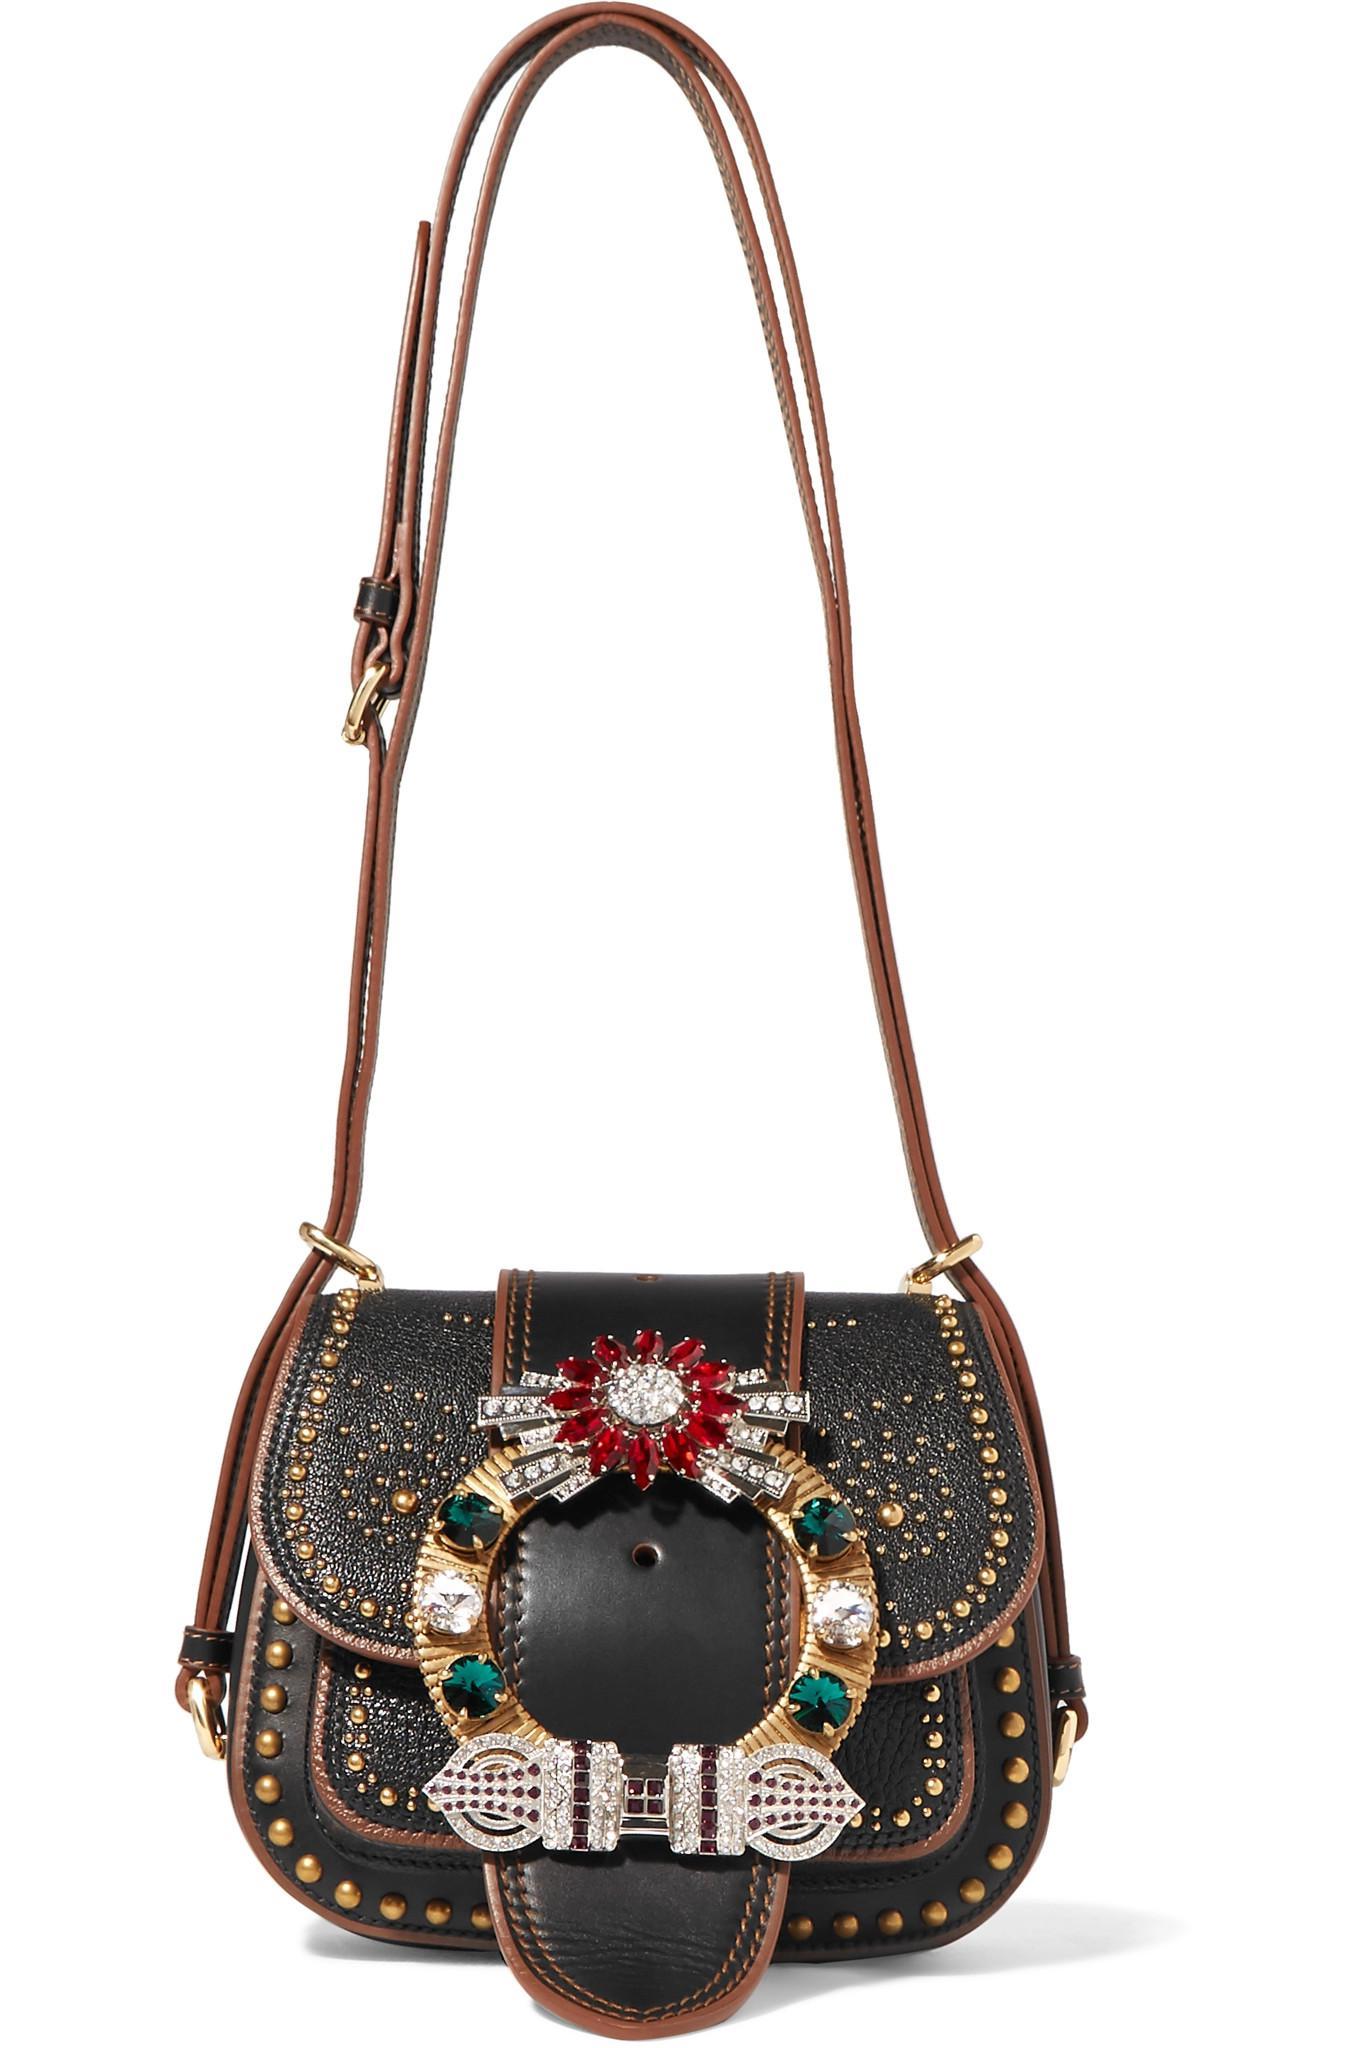 764420dfbb08 Lyst - Miu Miu Dahlia Embellished Leather Shoulder Bag in Black